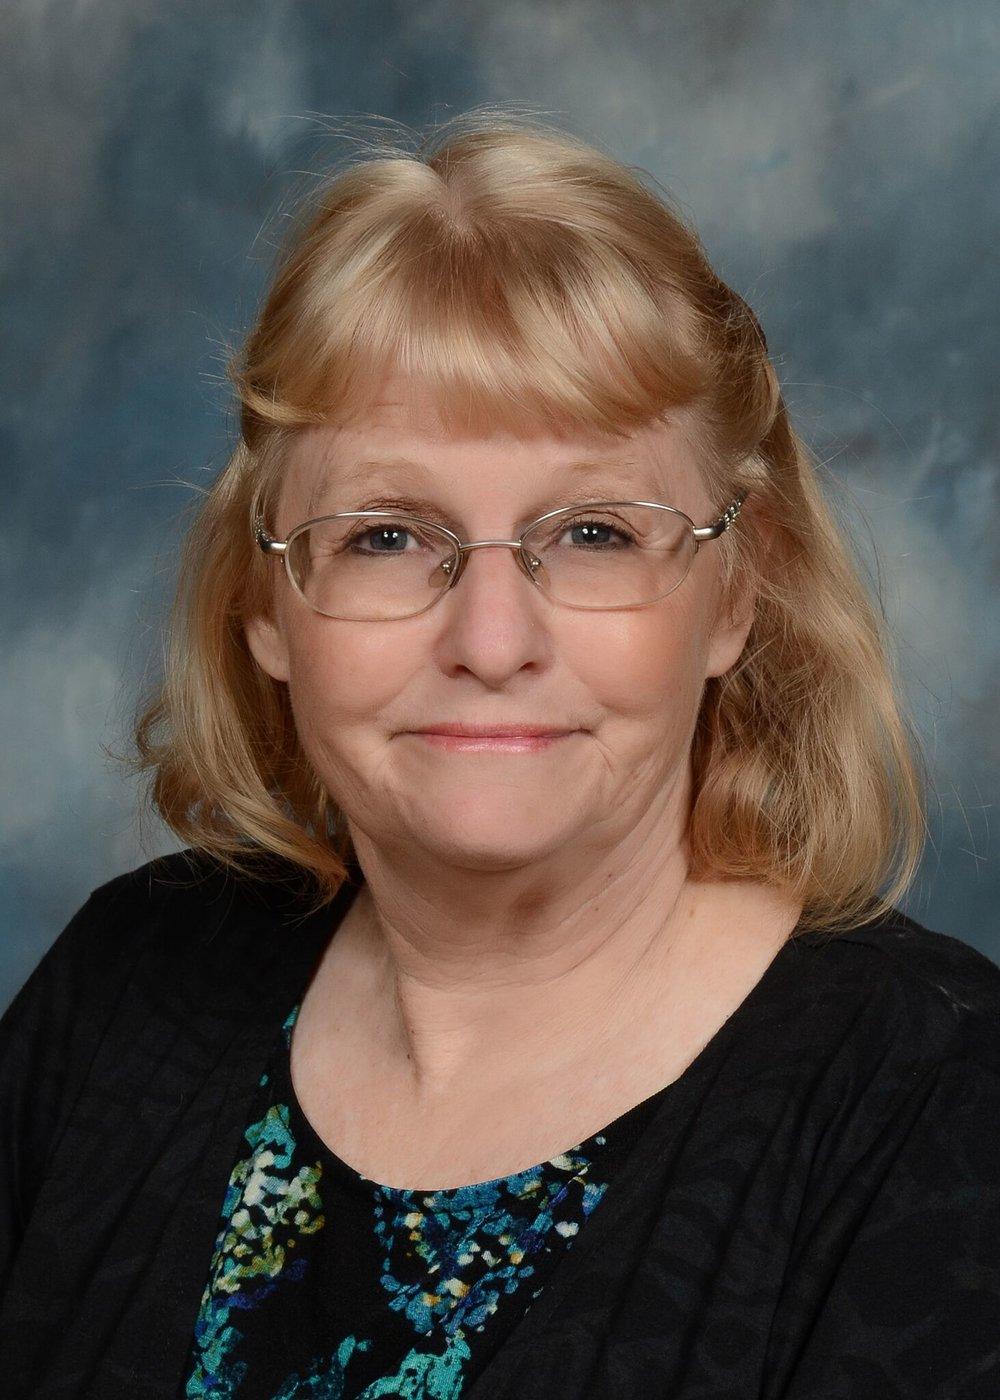 Mrs. Rodriques Preschool teacher